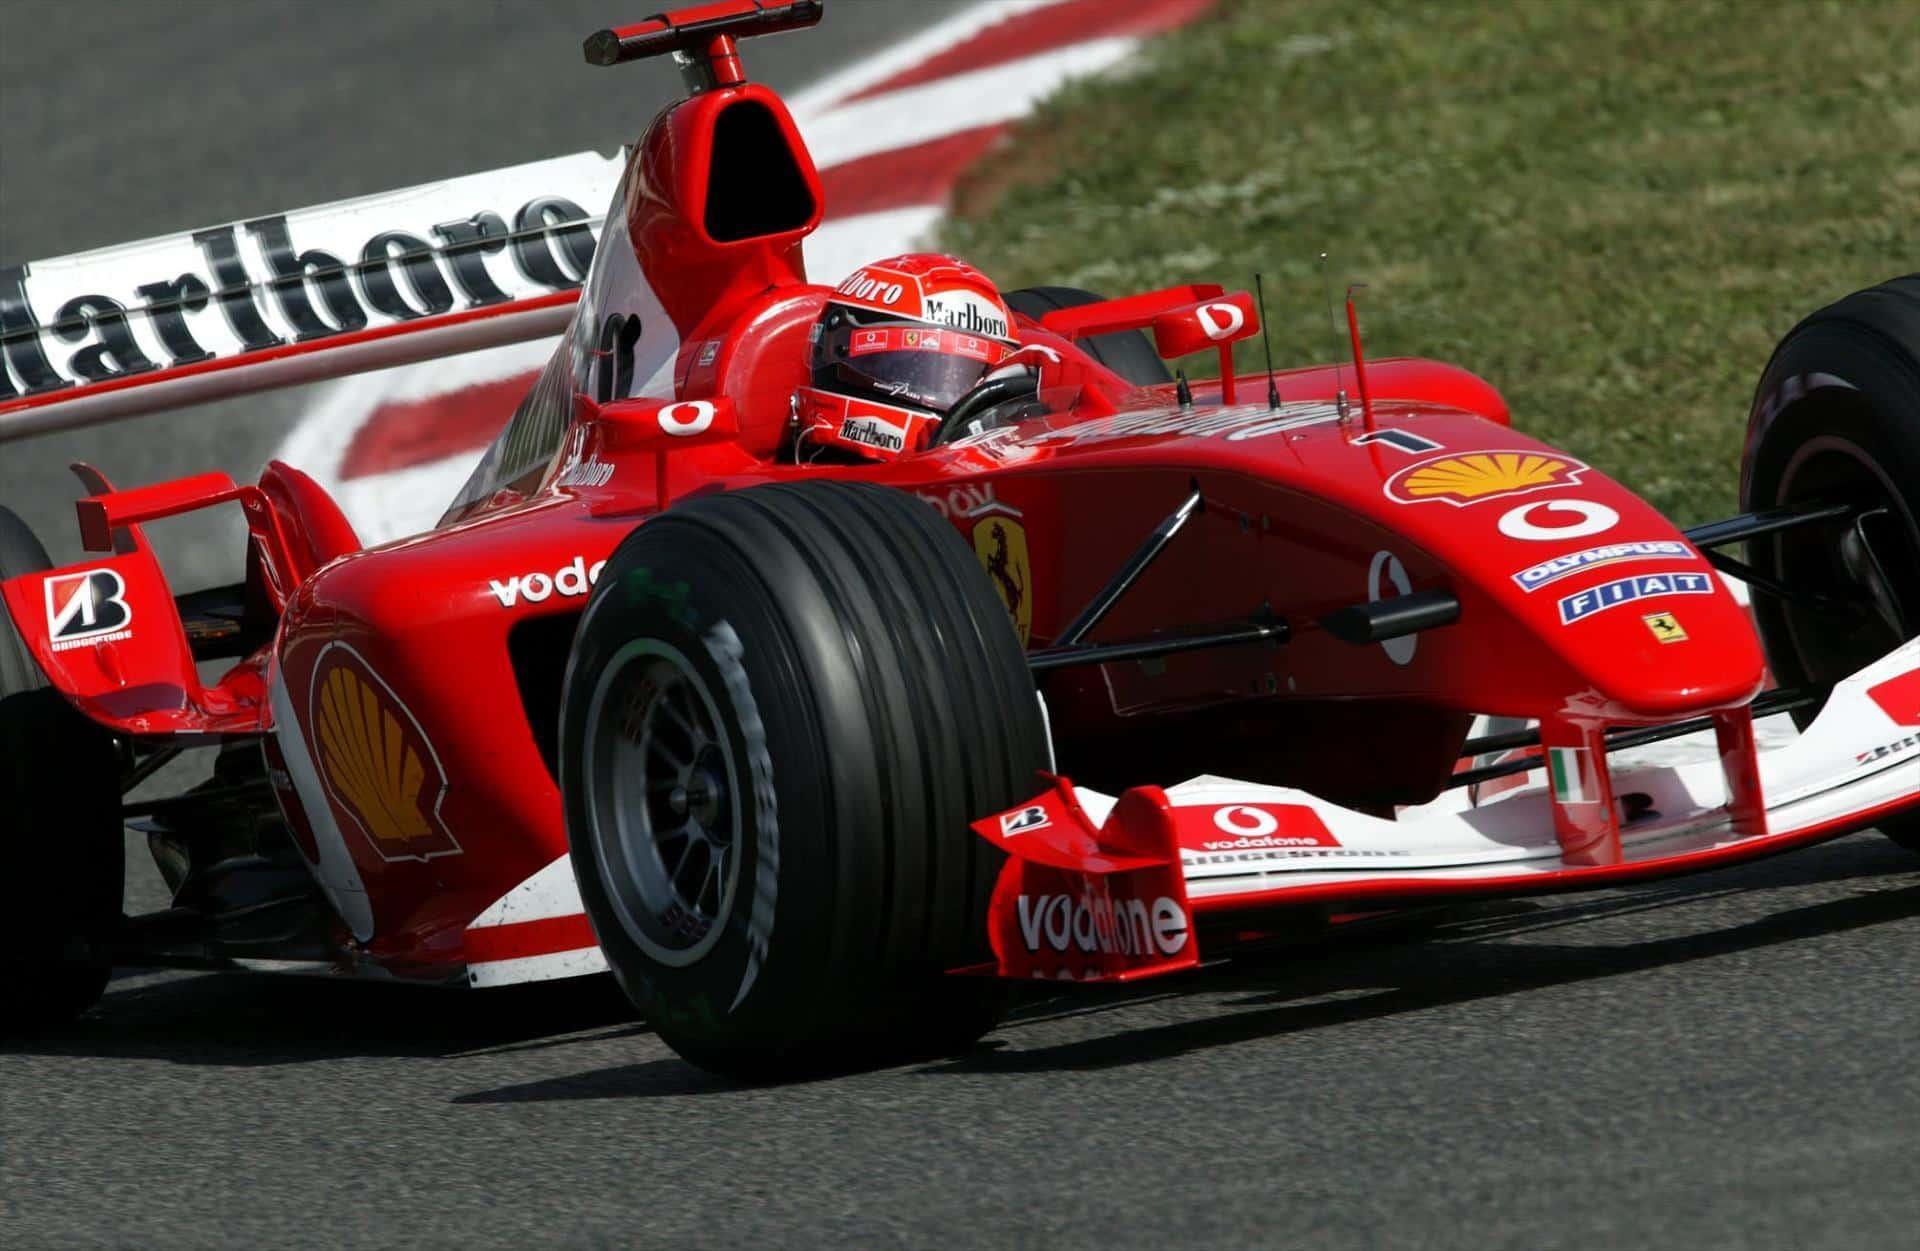 2003 Spanish Gp Schumacher Wins In New F2003 Ga Alonso Splits The Ferraris